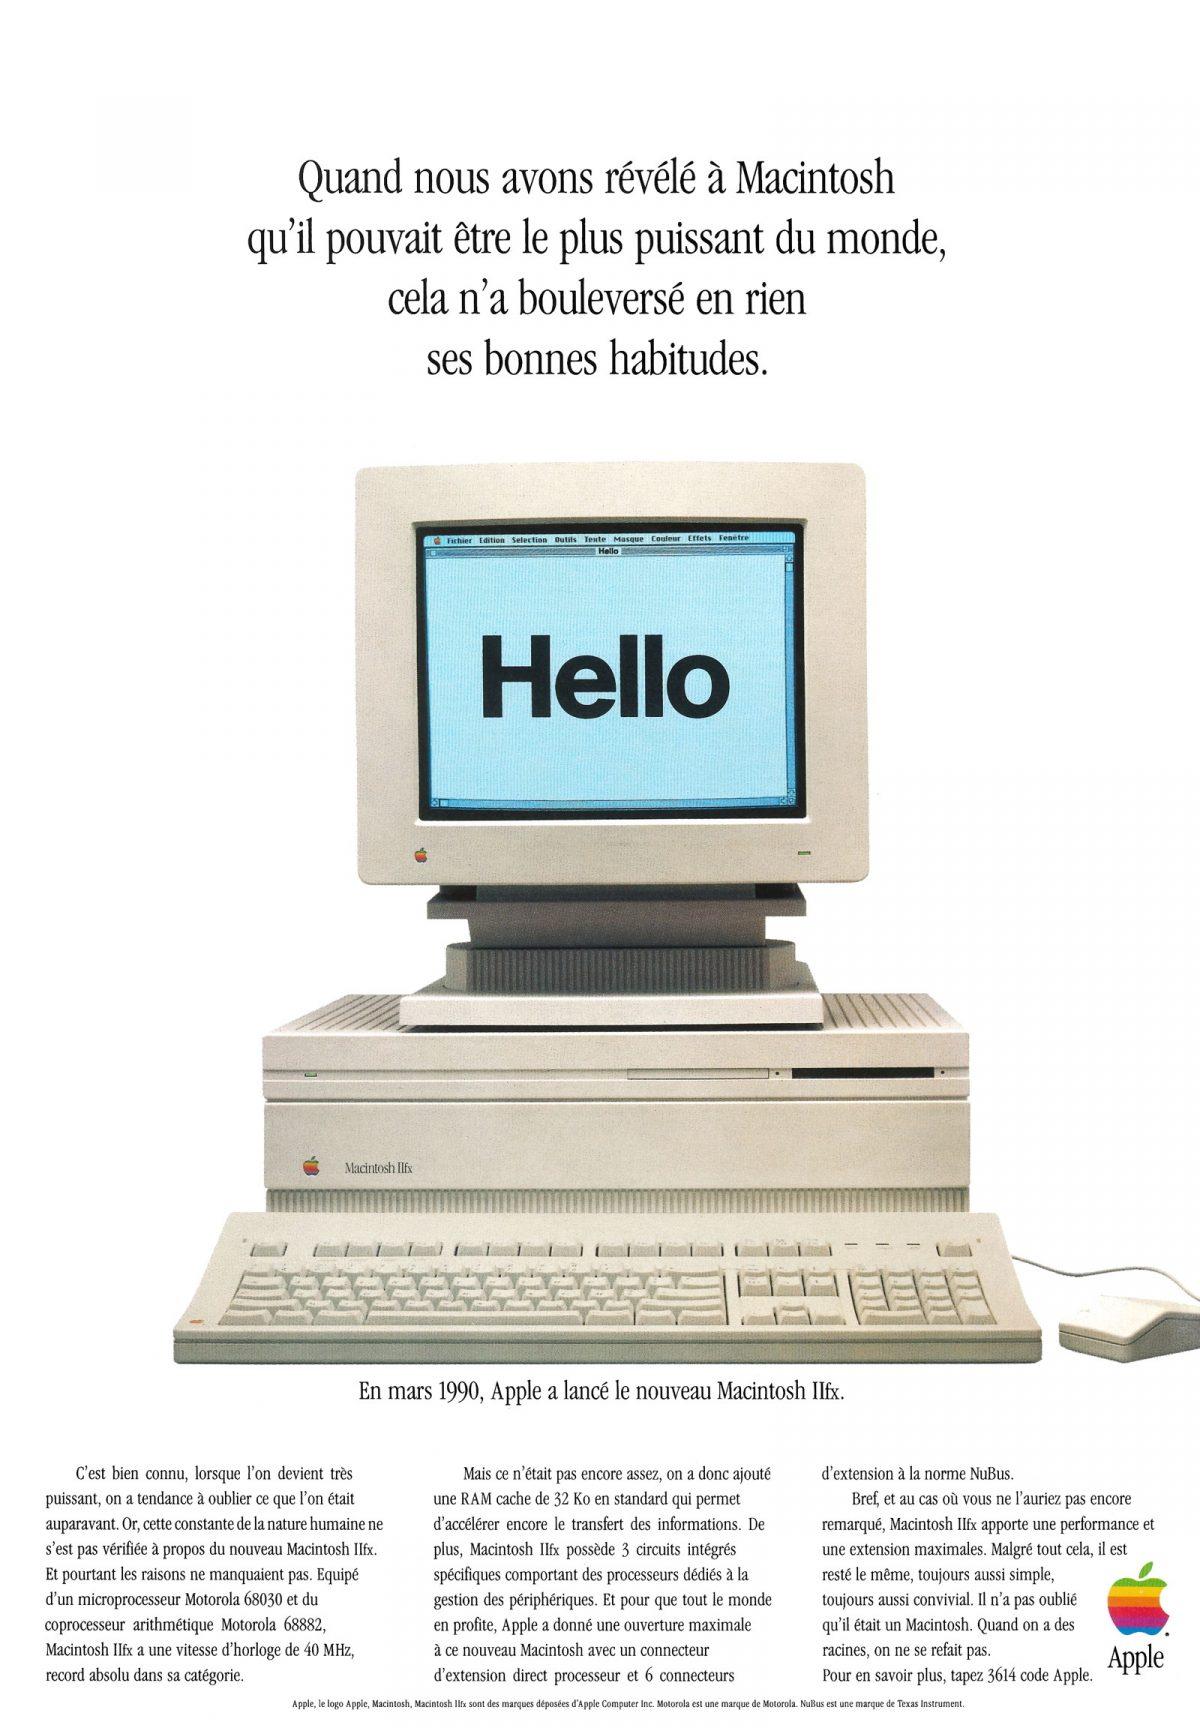 Apple Macintosh IIfx ad